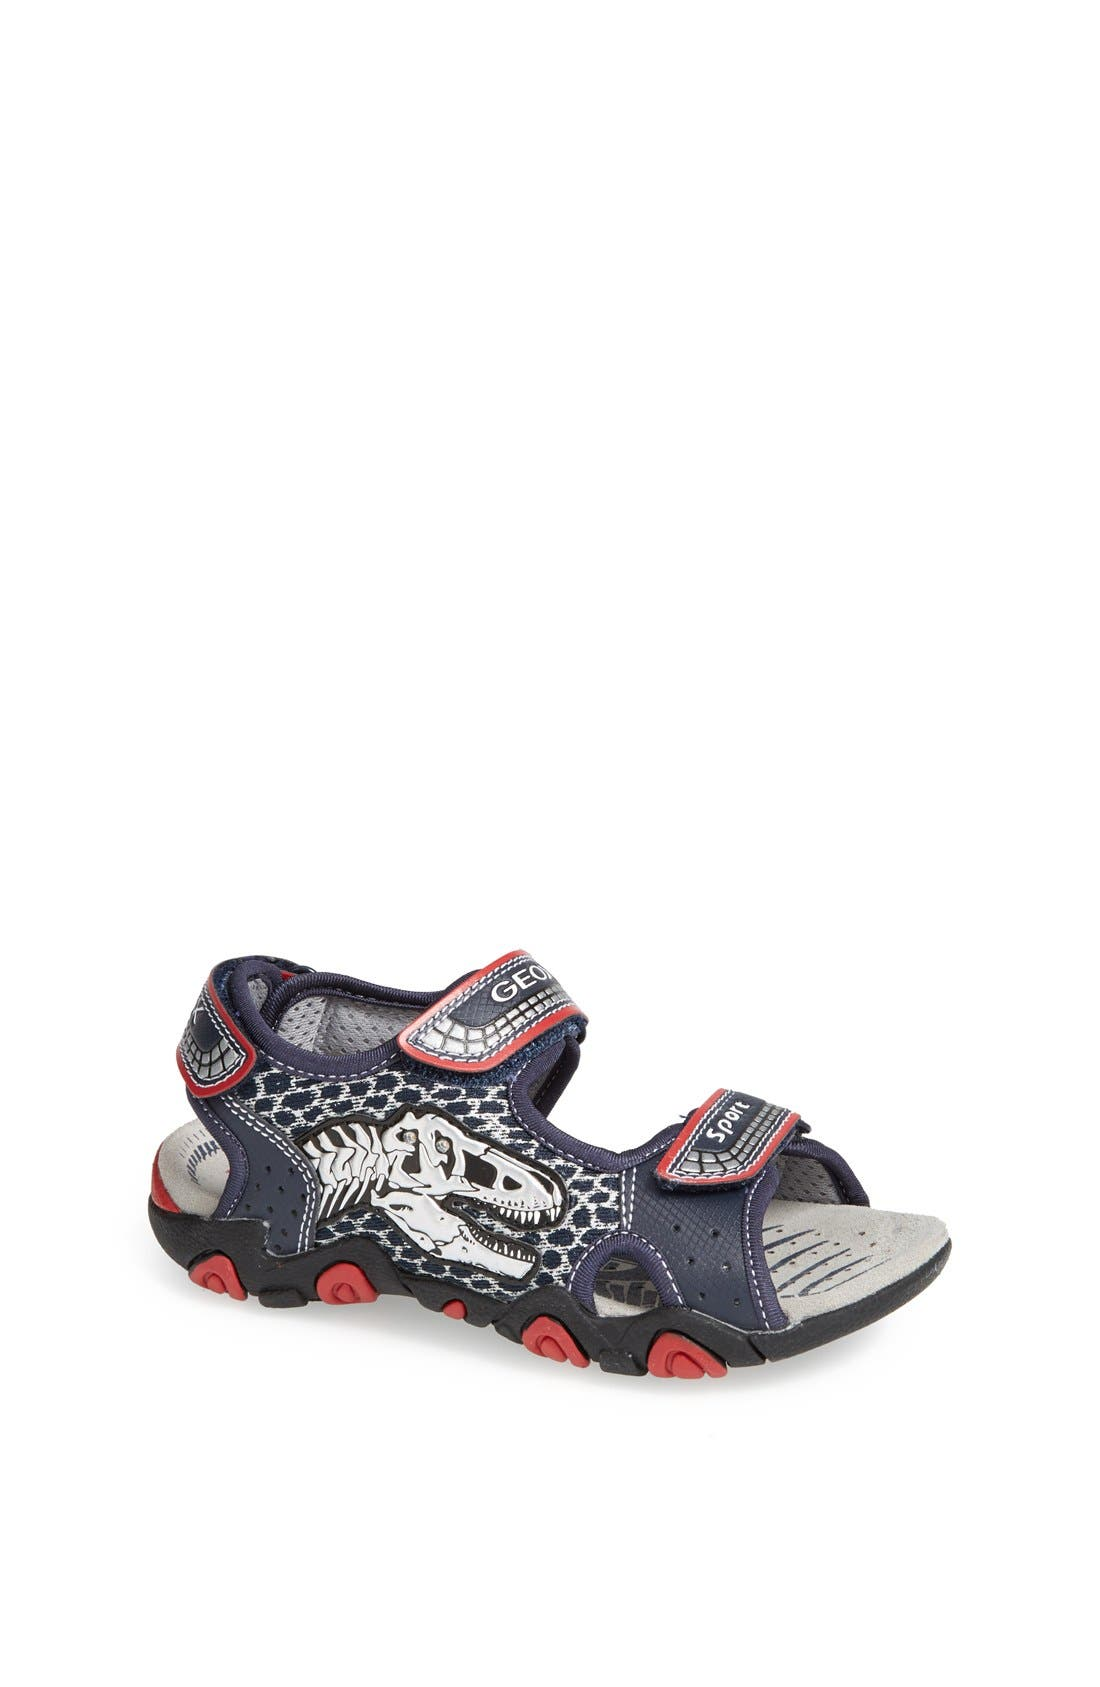 Geox 'Strike' Dinosaur Light-Up Sandal